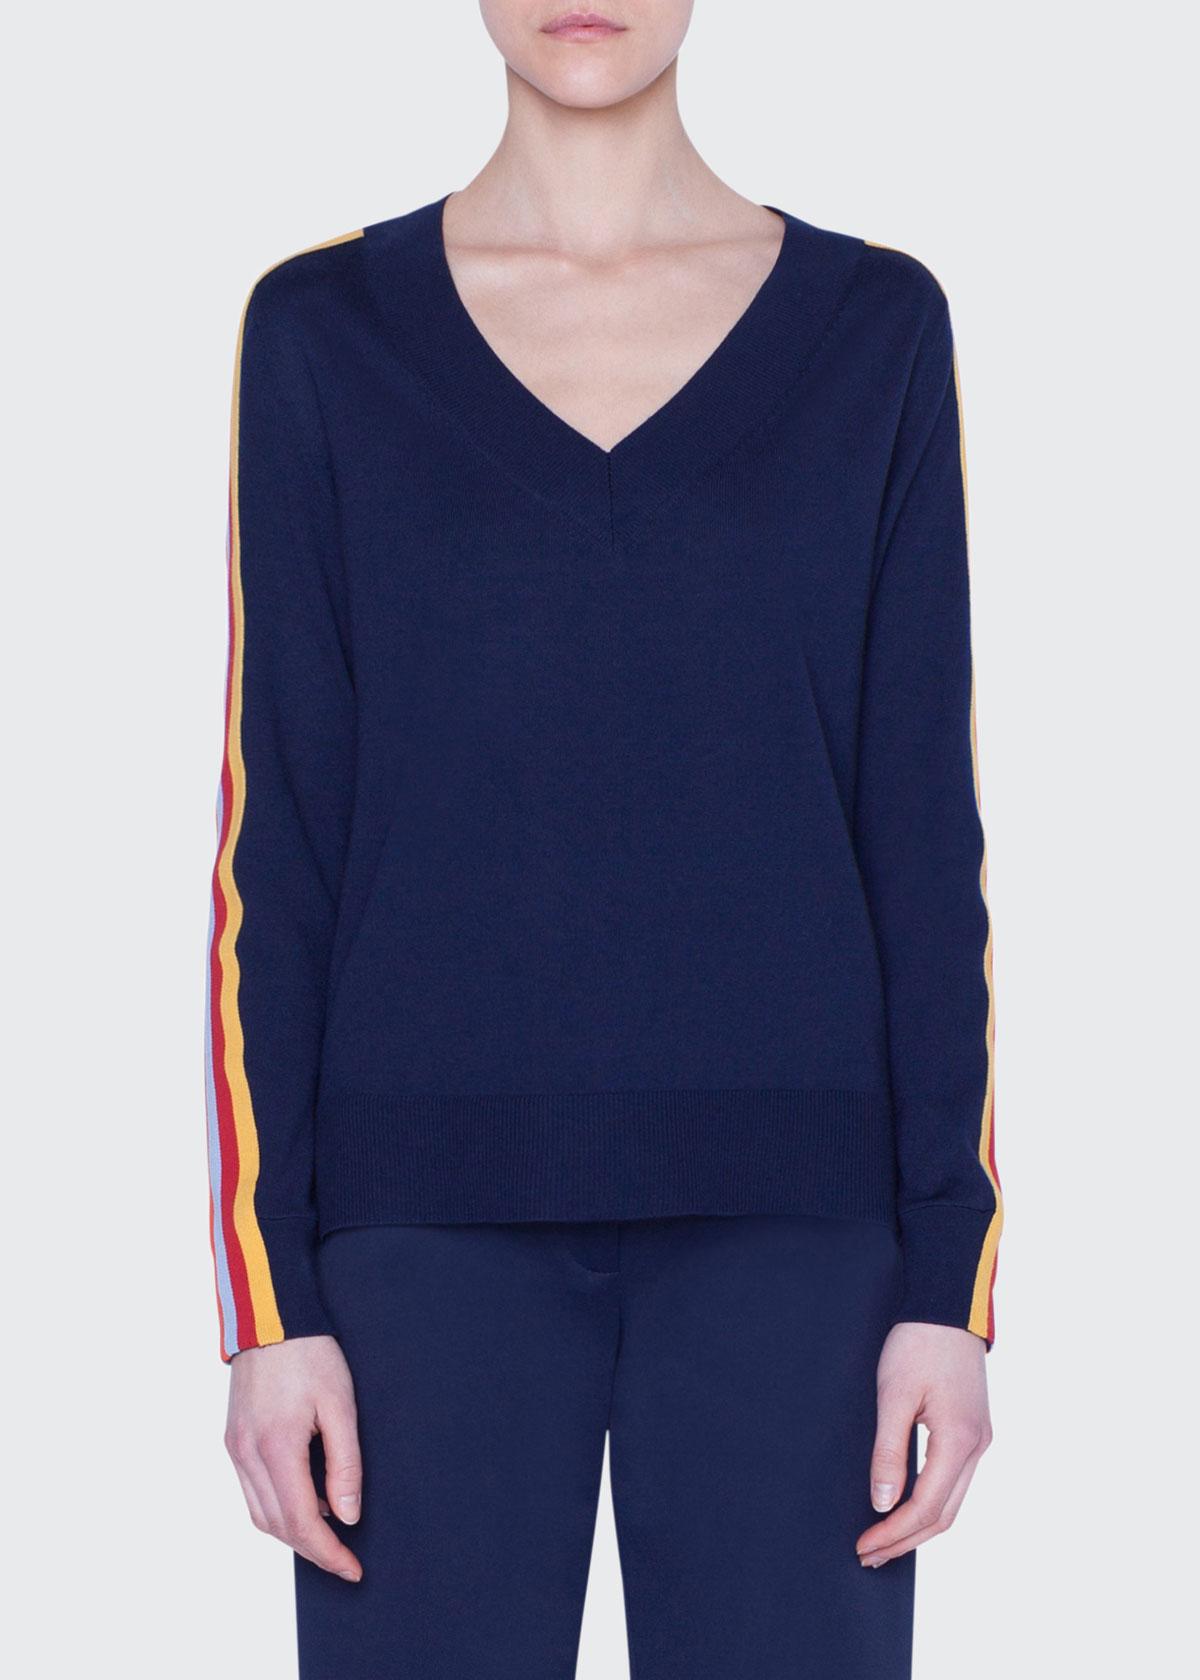 Akris Punto Sweaters RAINBOW-TAPED WOOL SWEATER